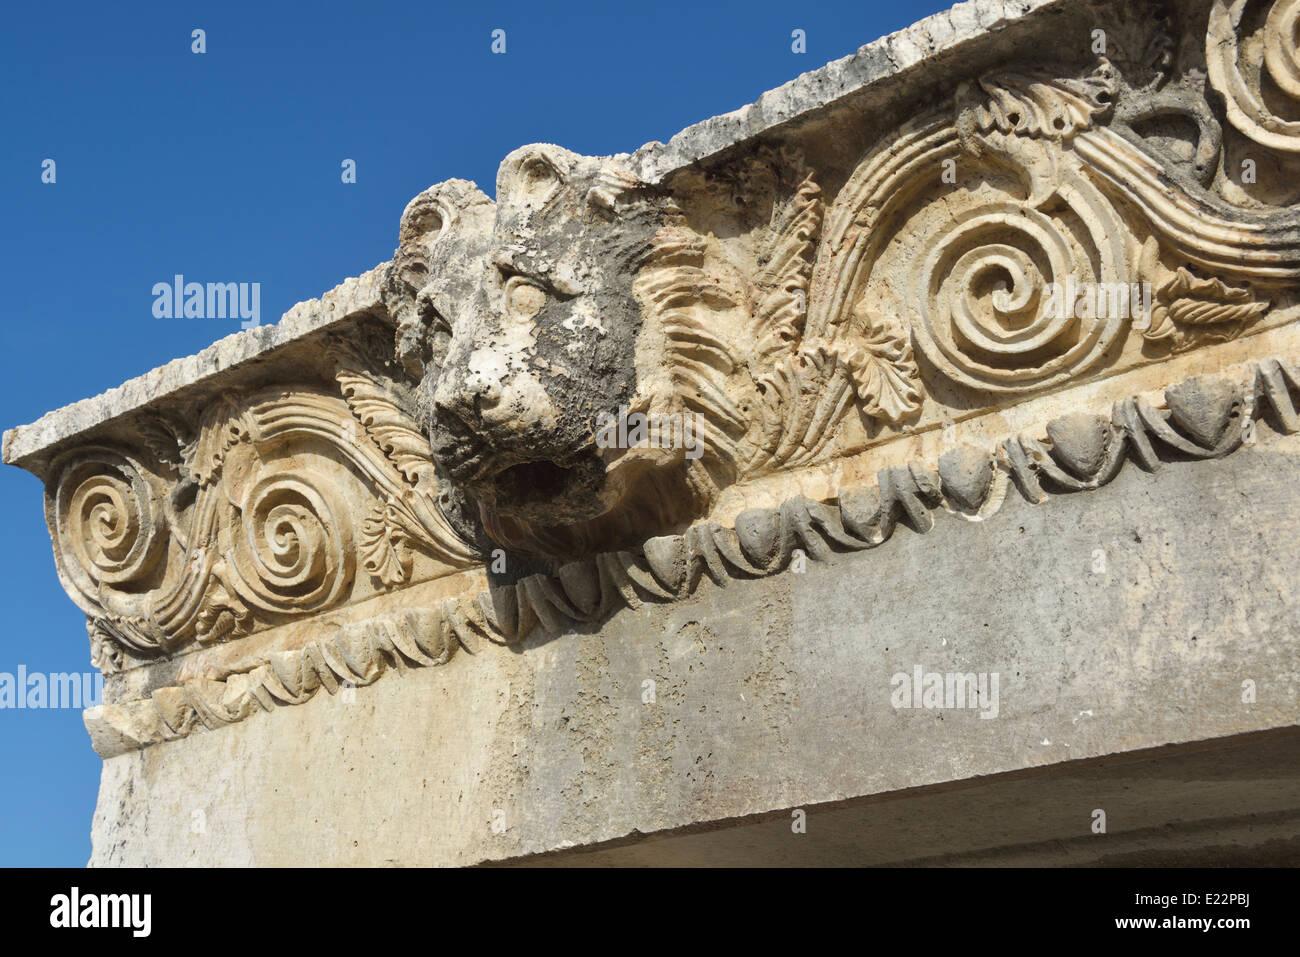 Lion downspout, Letoon, Turkey 140422_60989 - Stock Image